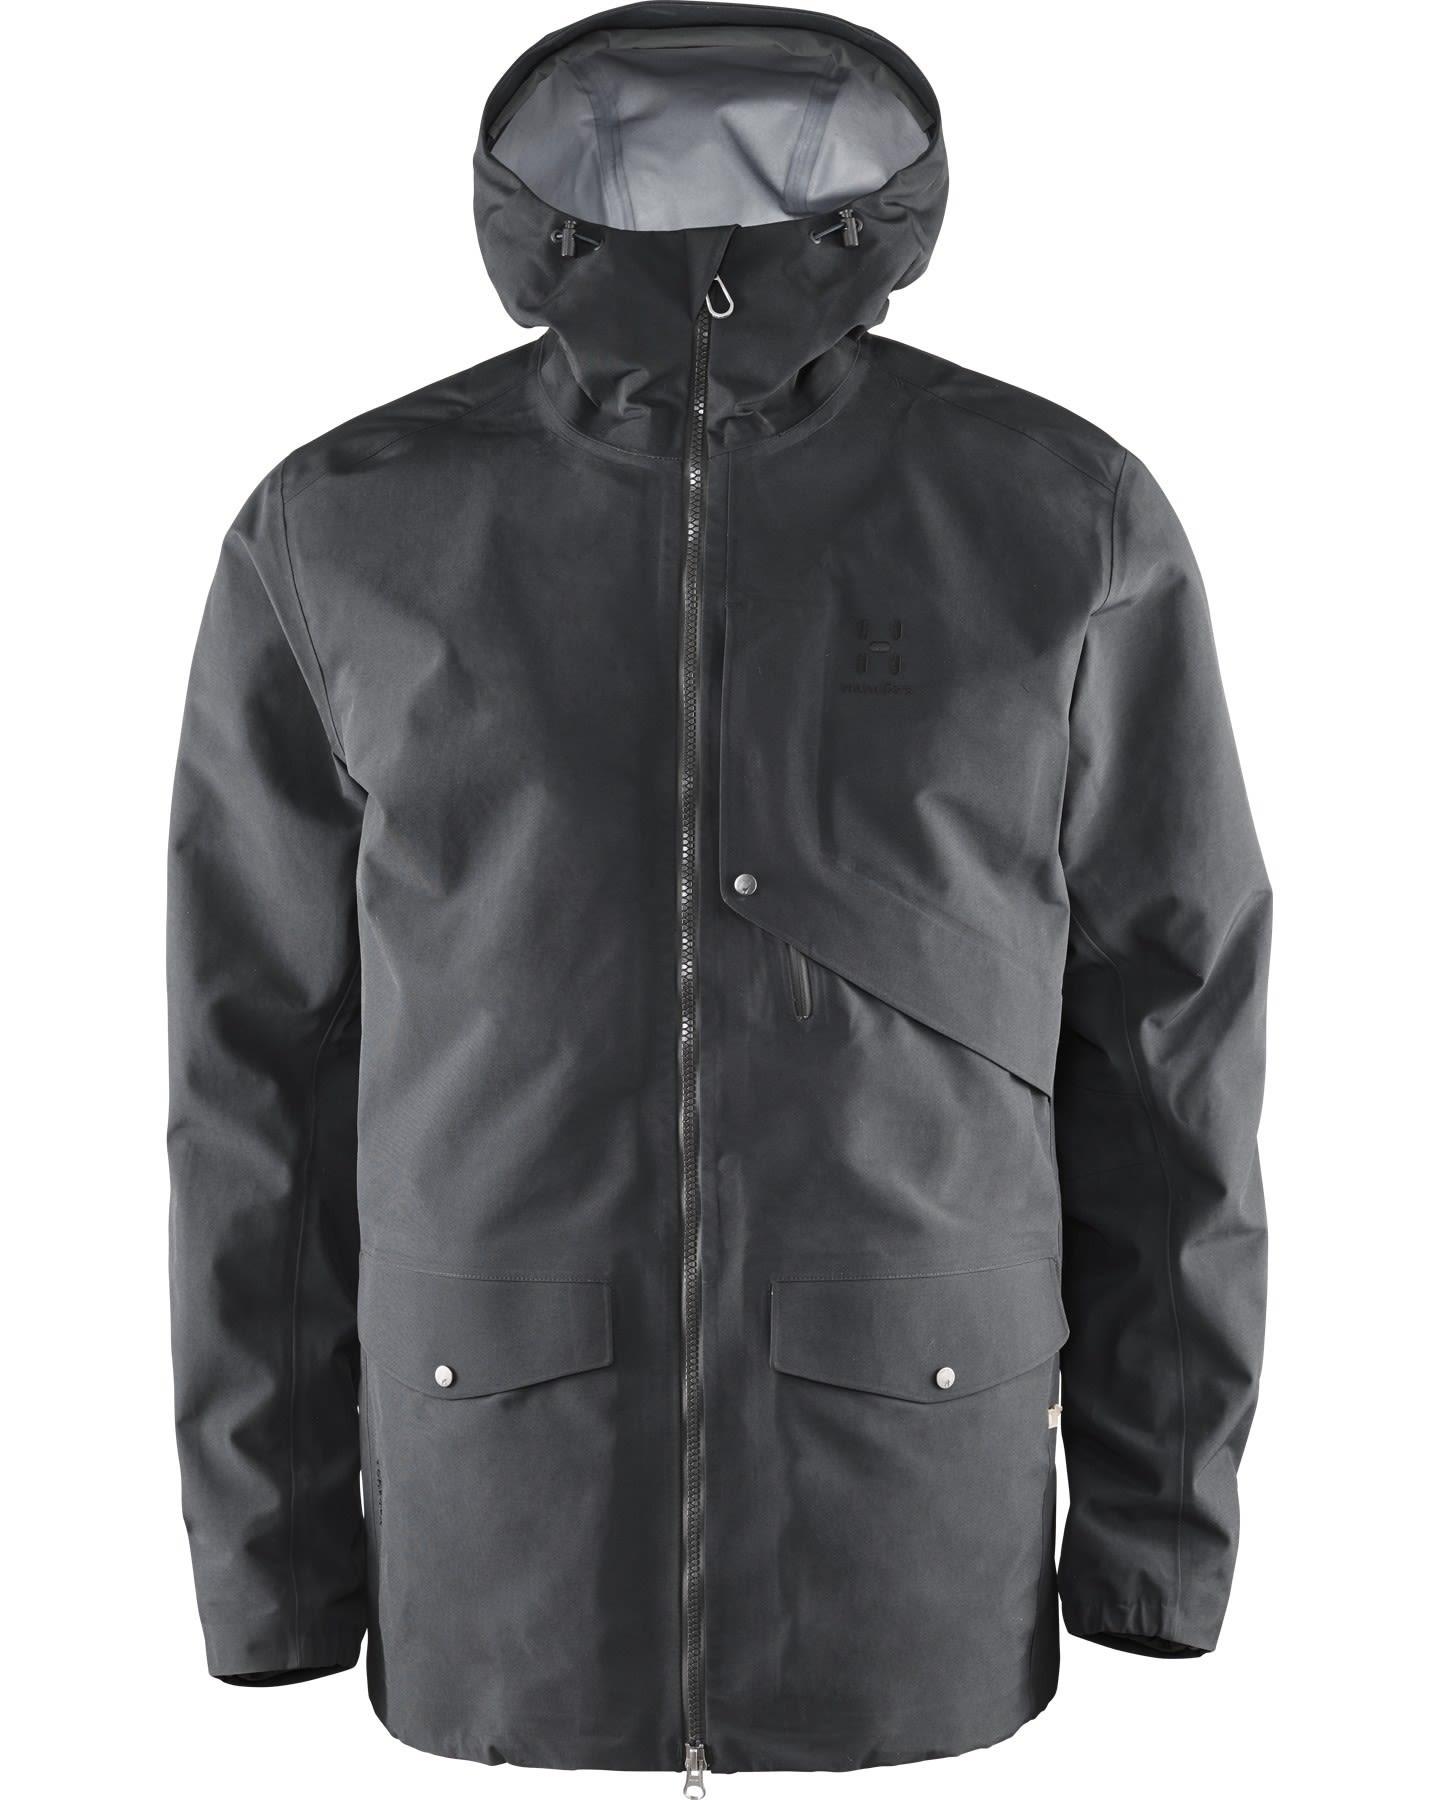 Haglöfs Selja Jacket (Modell Winter 2017) Schwarz, Male Gore-Tex® Freizeitjack